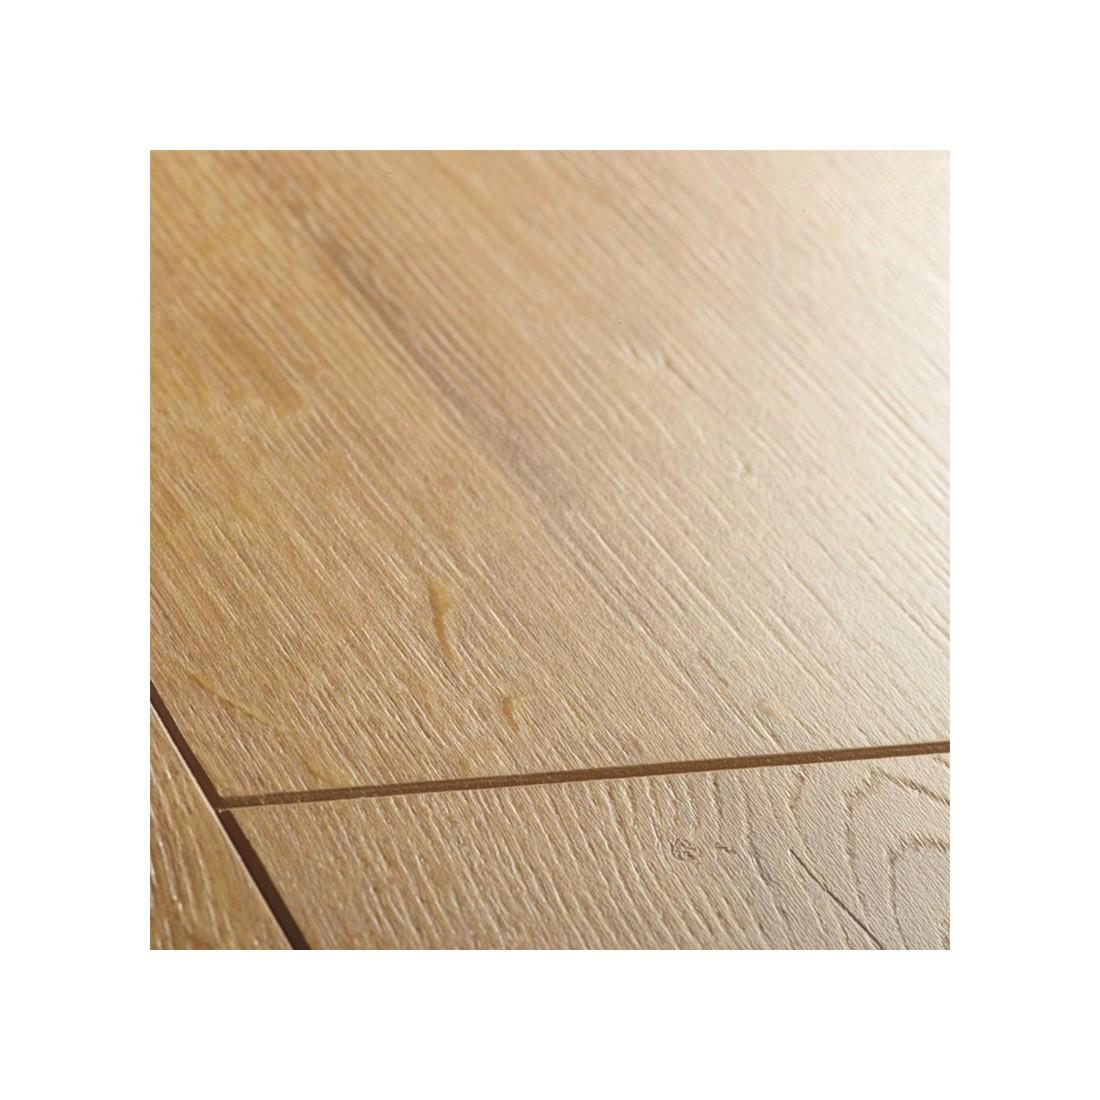 Suelo laminado quick step largo roble cambridge natural for Color roble natural